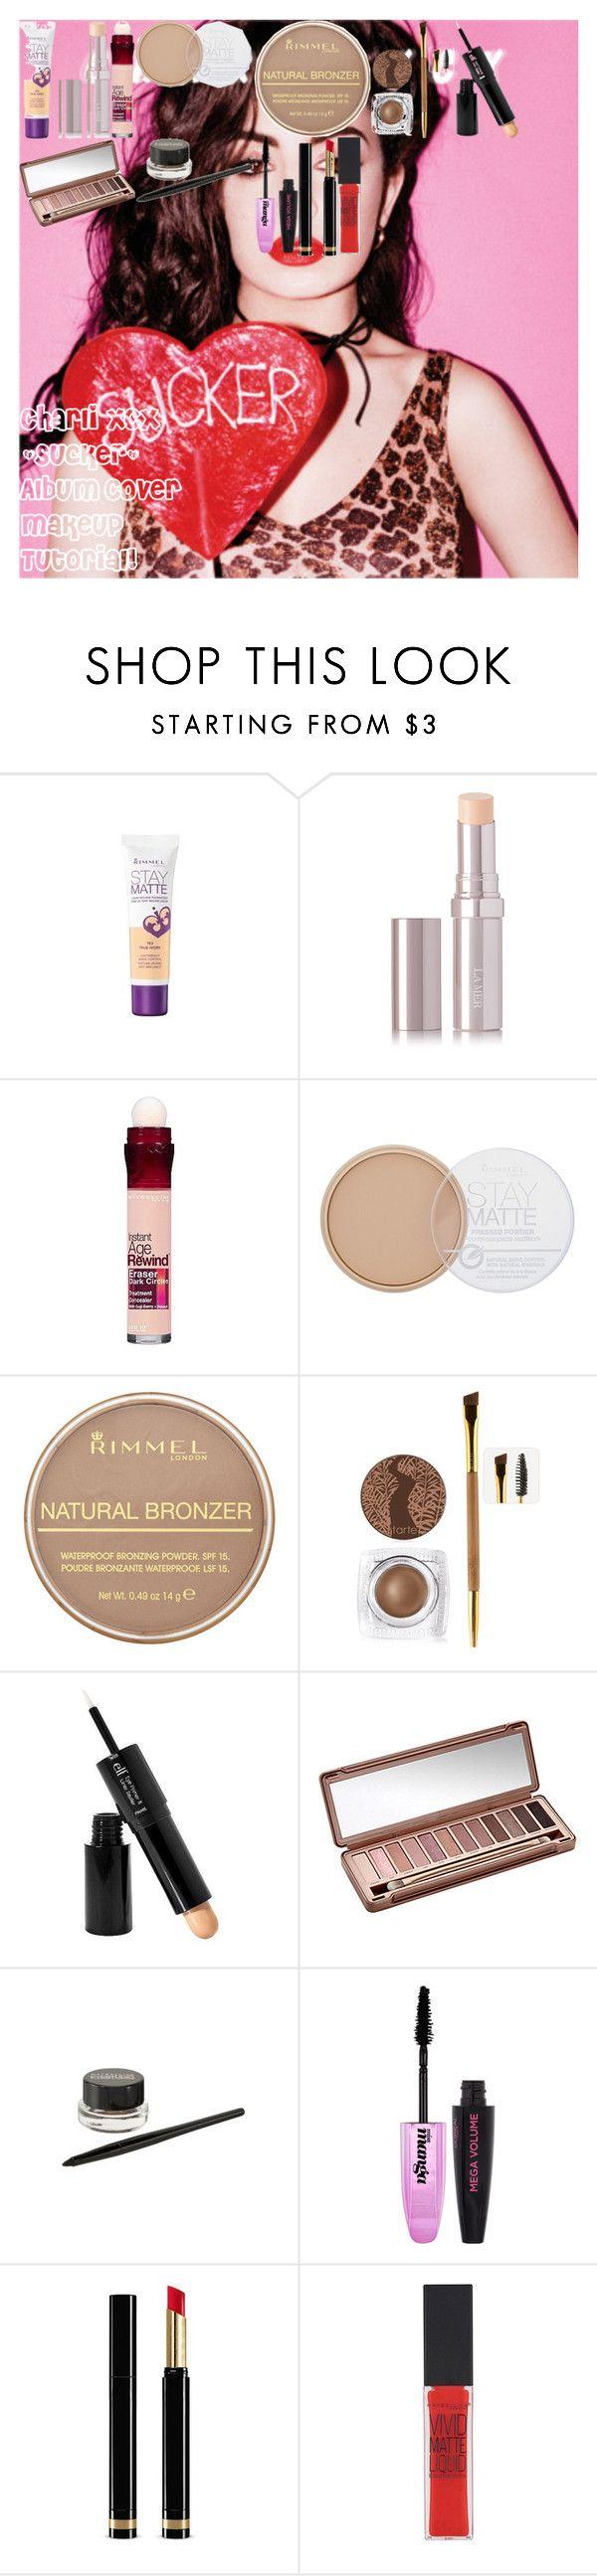 "Charli XCX ""Sucker"" Album Cover Makeup Tutorial! by oroartye-1 on Polyvore featuring beauty, La Mer, Urban Decay, tarte, Gucci, Rimmel, L'Oréal Paris, Maybelline, e.l.f. and Charli"